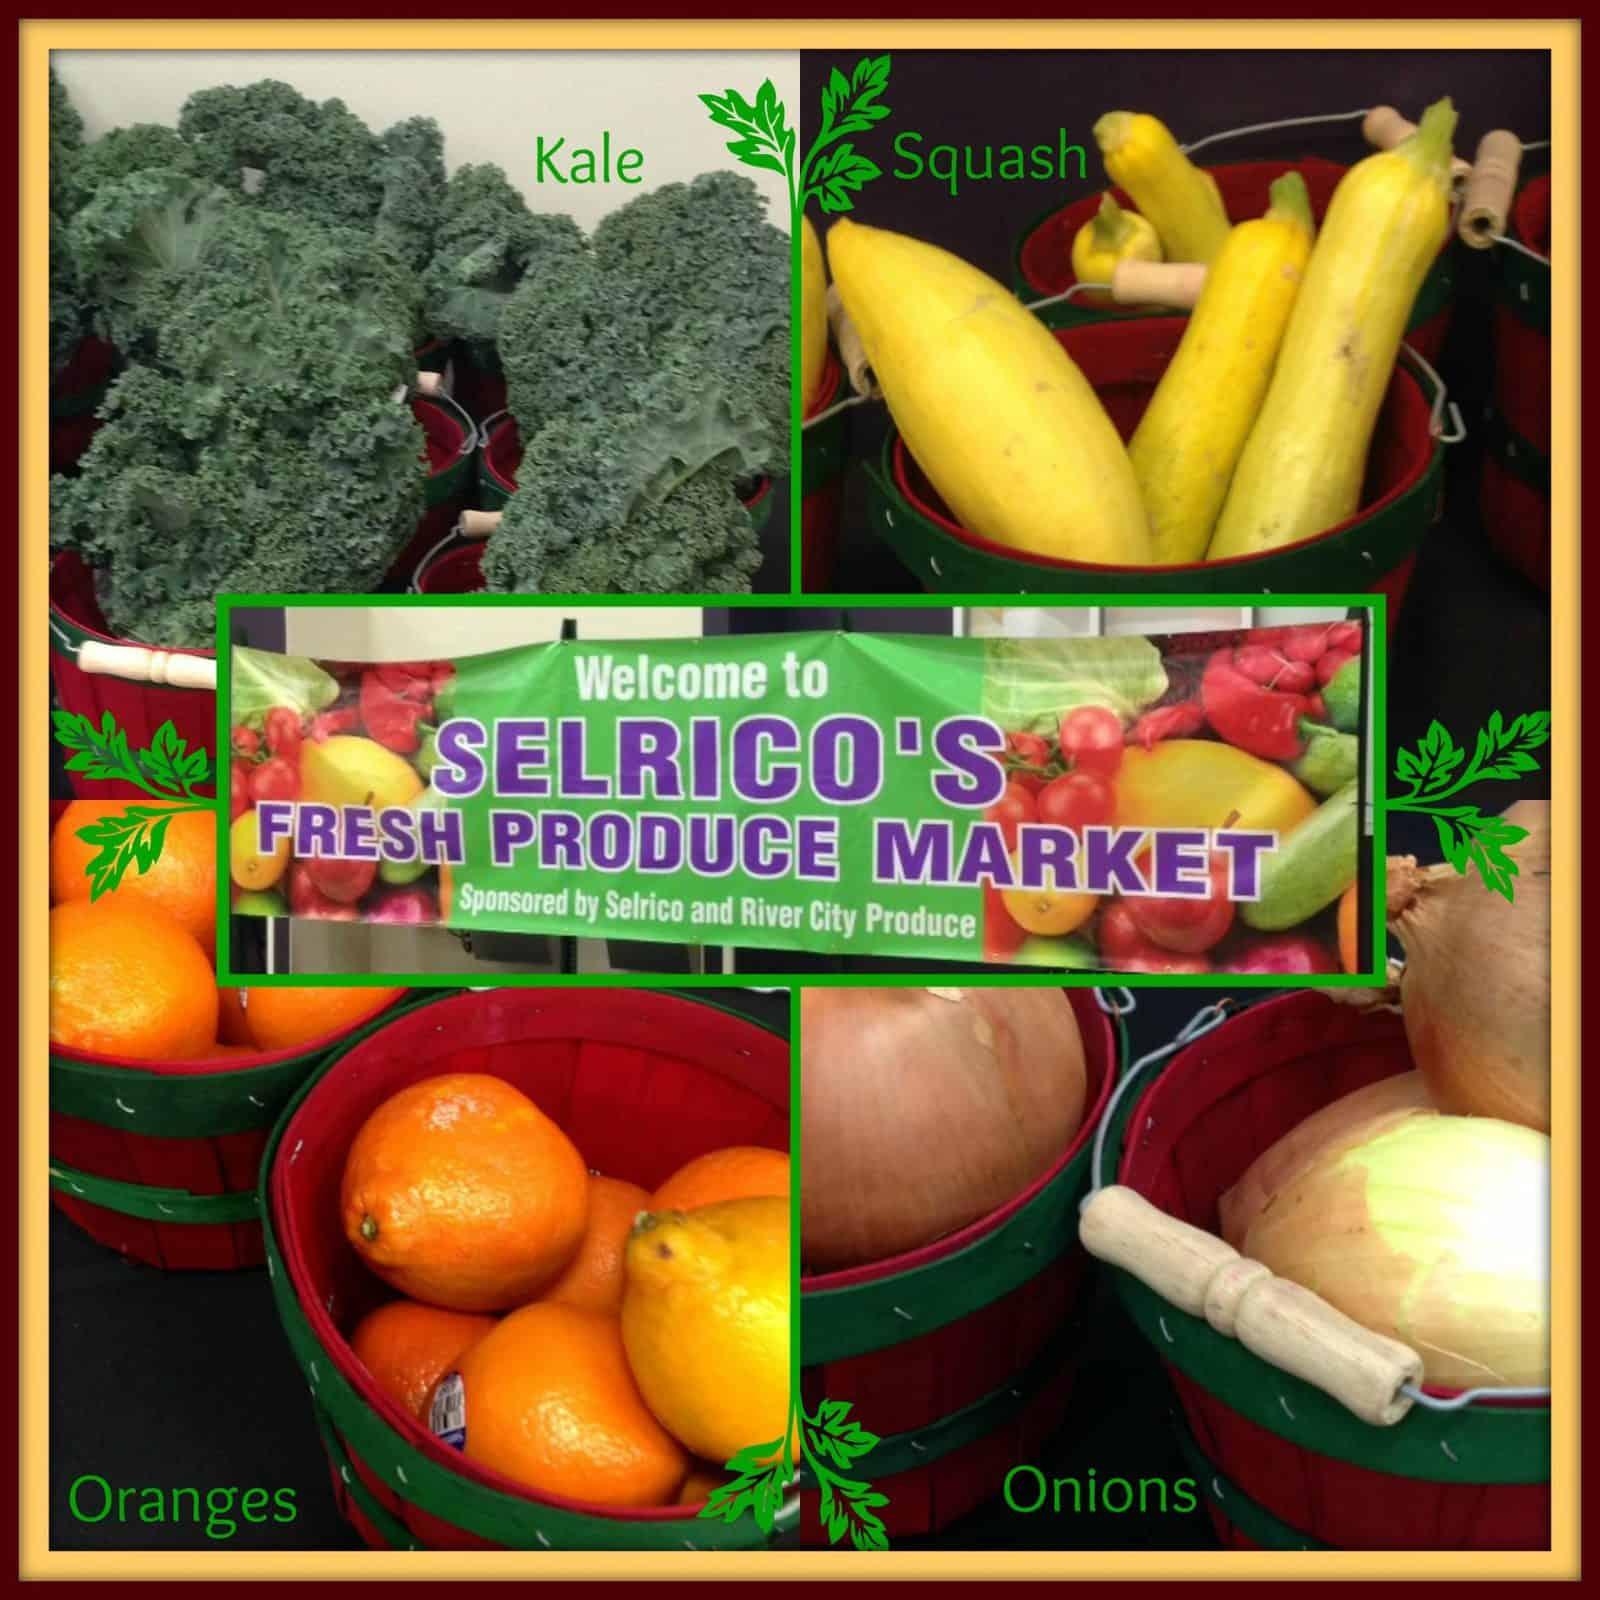 Selrico Pre-K 4 SA produce market